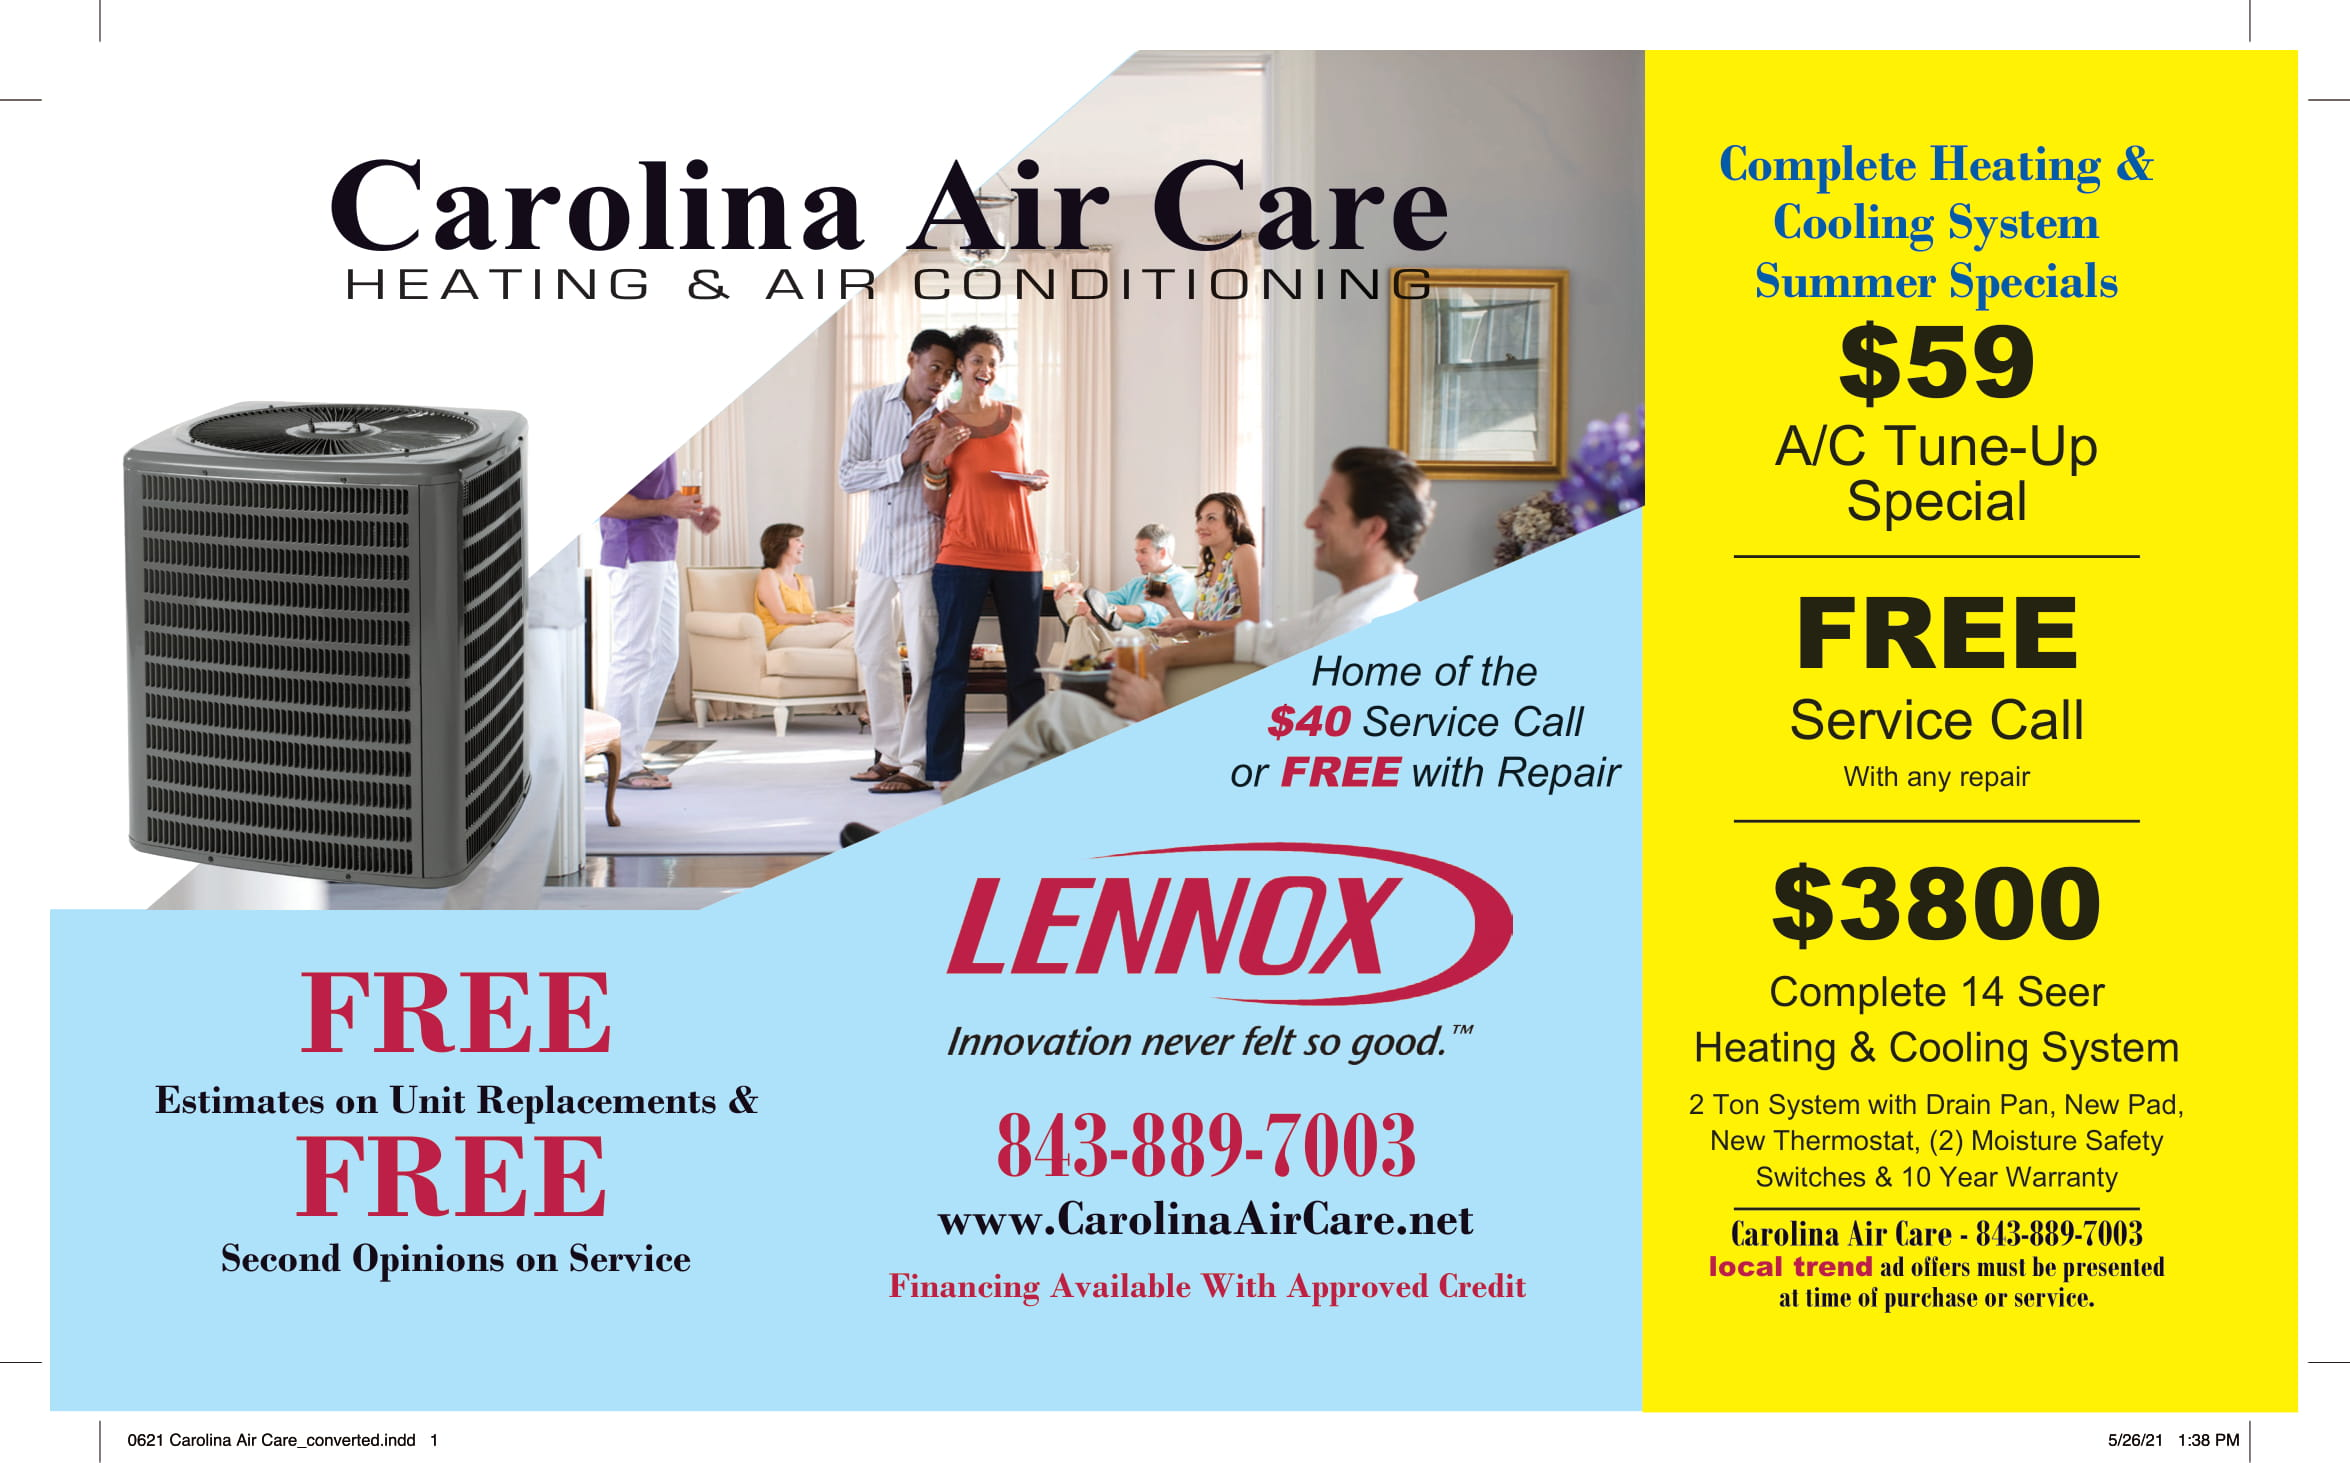 0621 Carolina Air Care converted 1